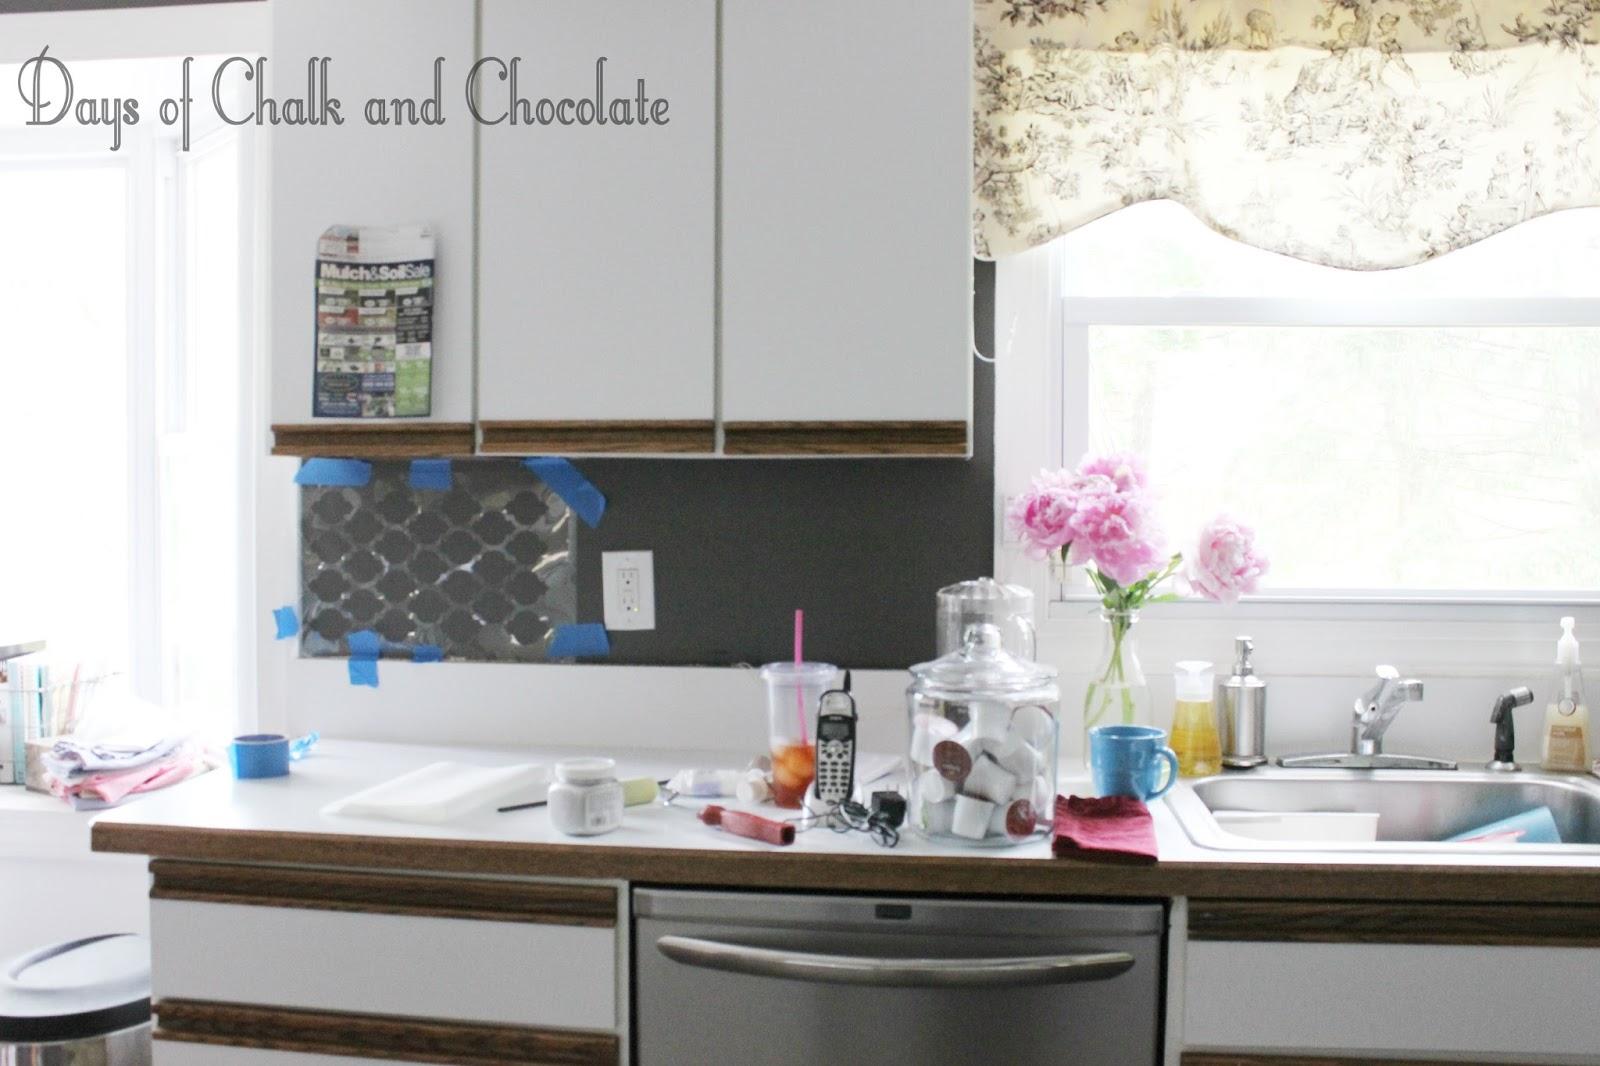 Easy DIY SelfAdhesive Faux Tile Backsplash Days of Chalk and